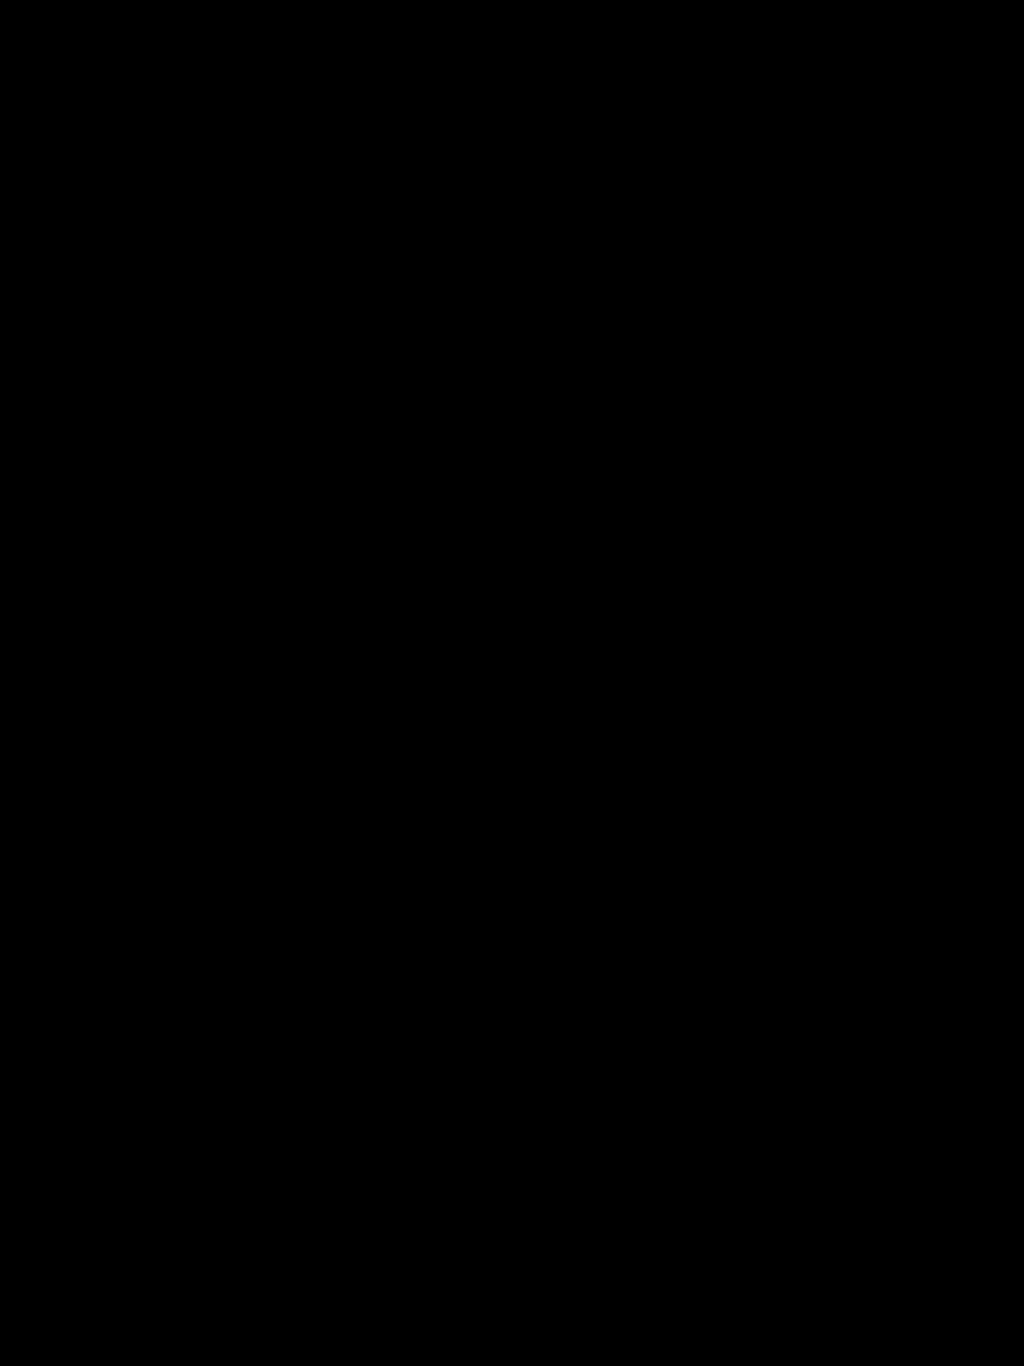 Cross silhouette clipart jpg black and white library Unique Cross Silhouette Clipart Cdr jpg black and white library